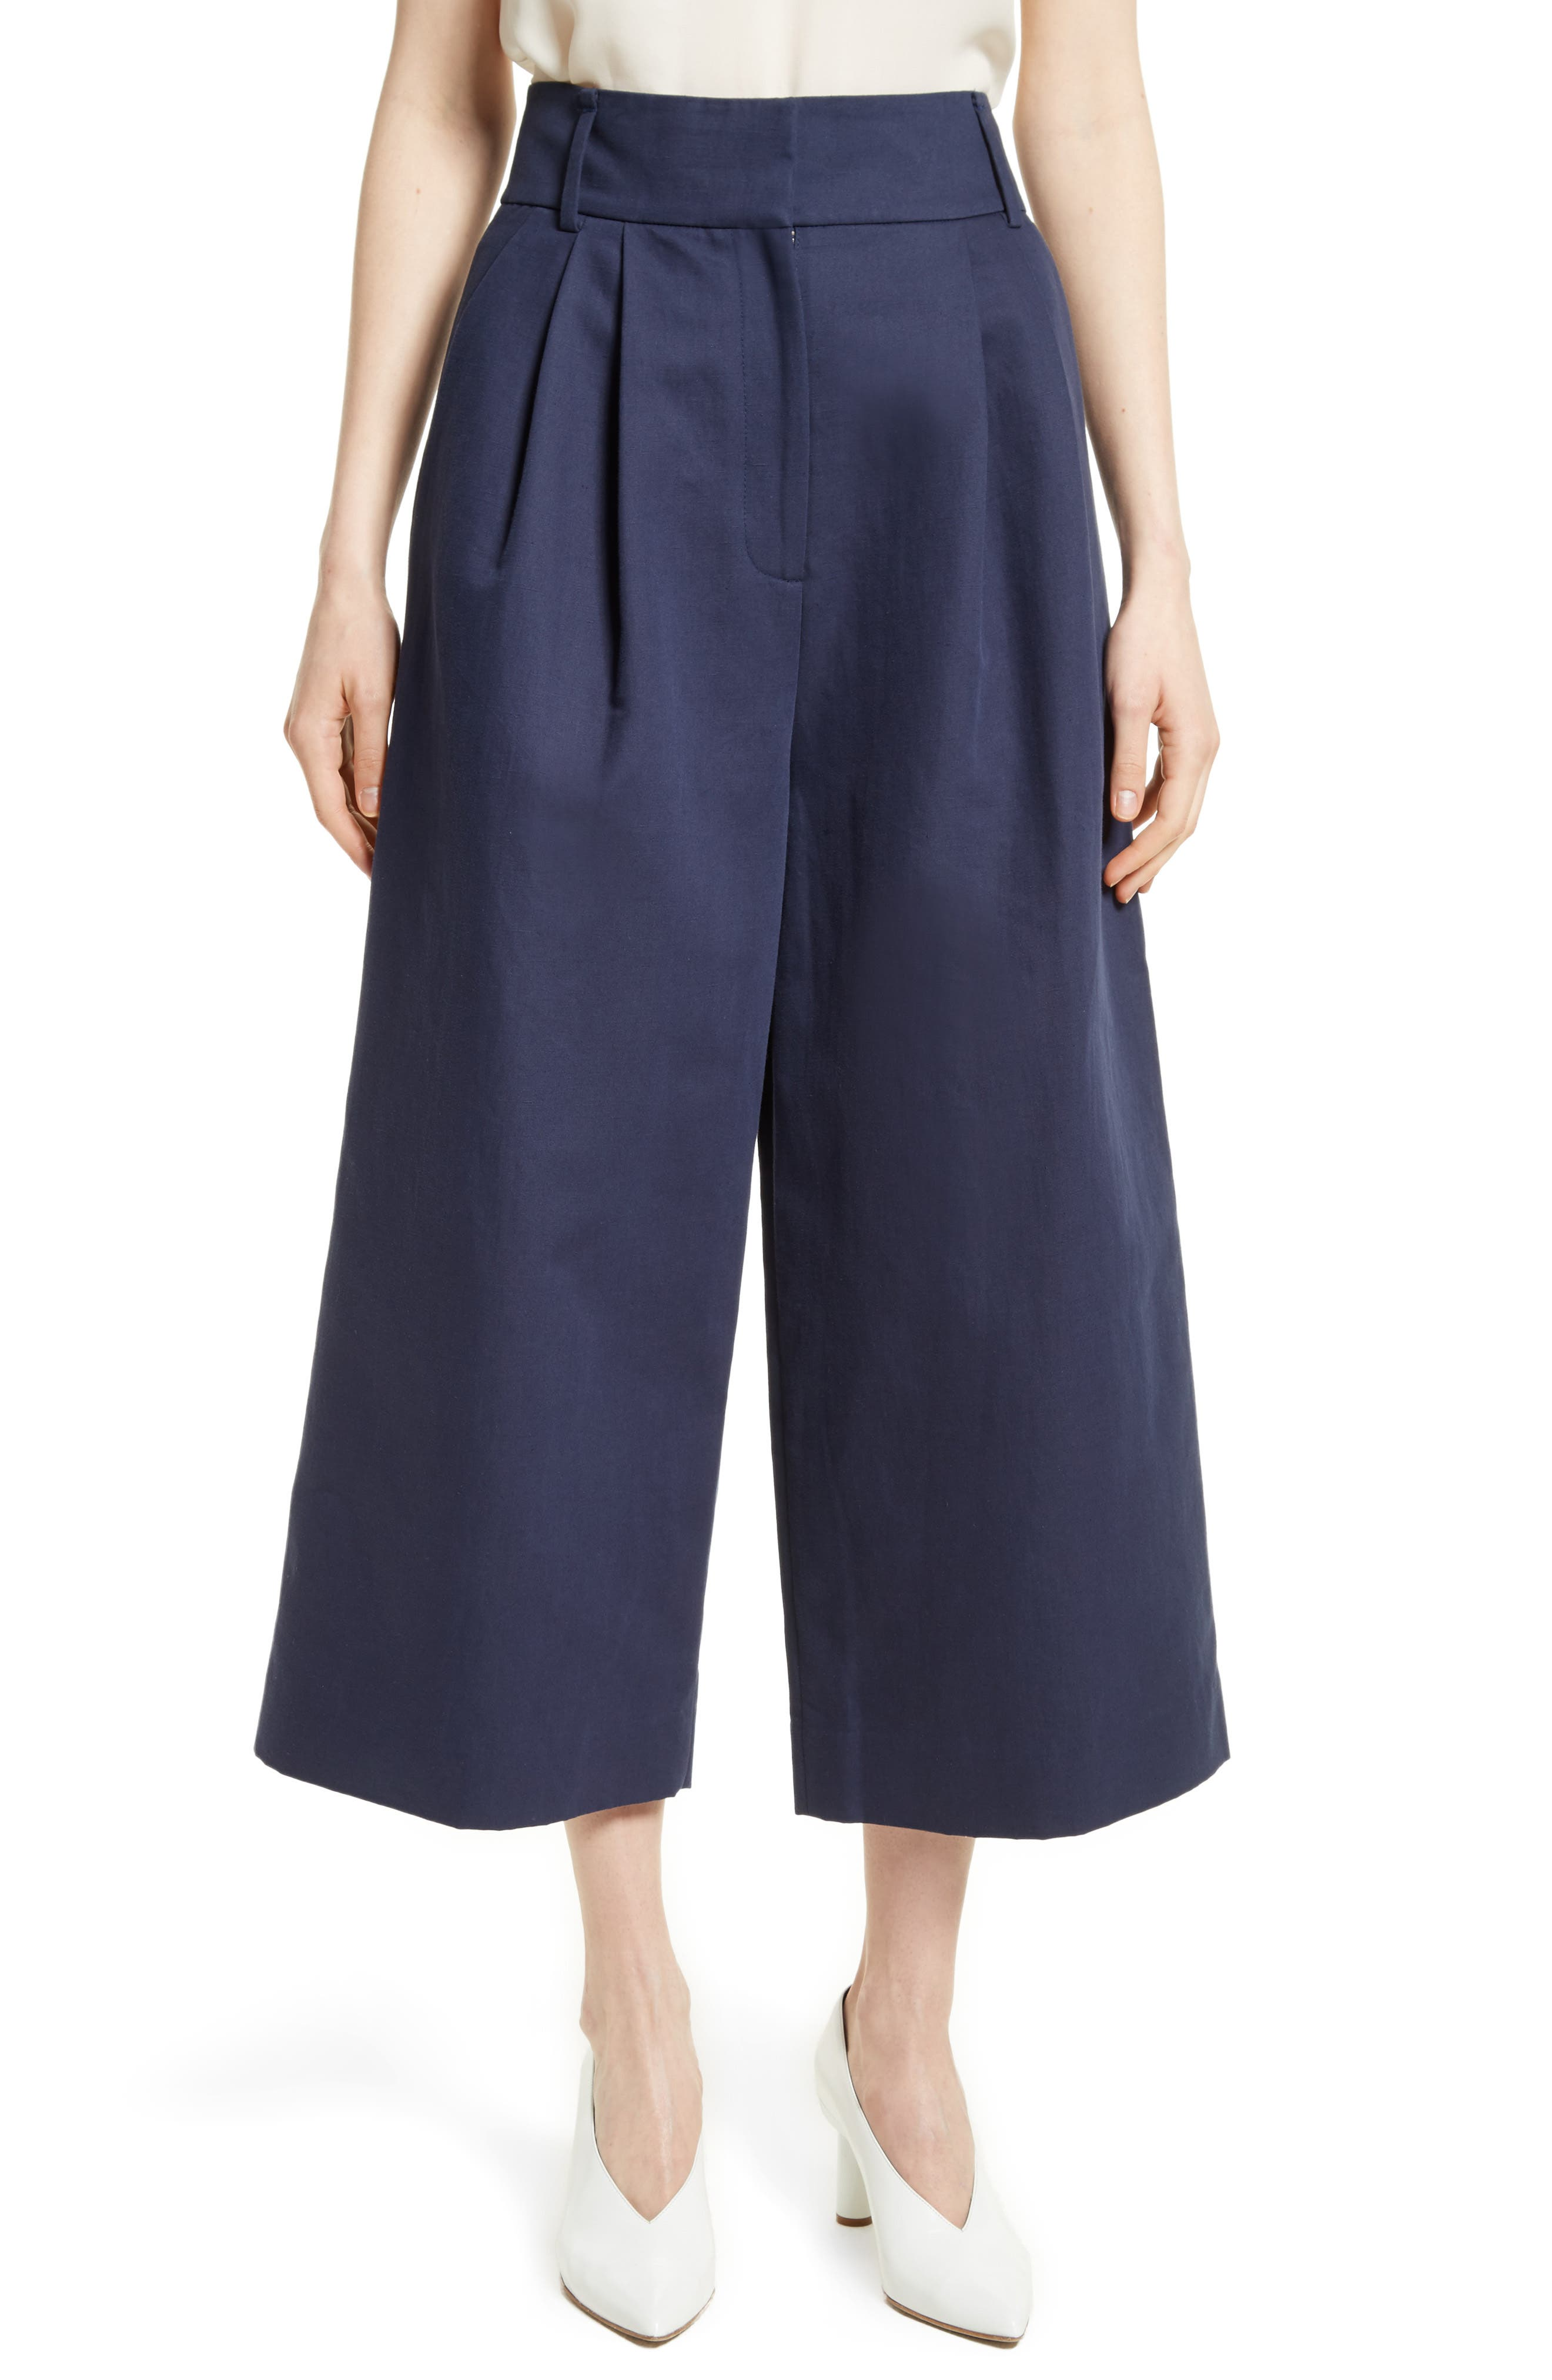 Tibi Chassis Plain Weave Crop Pants